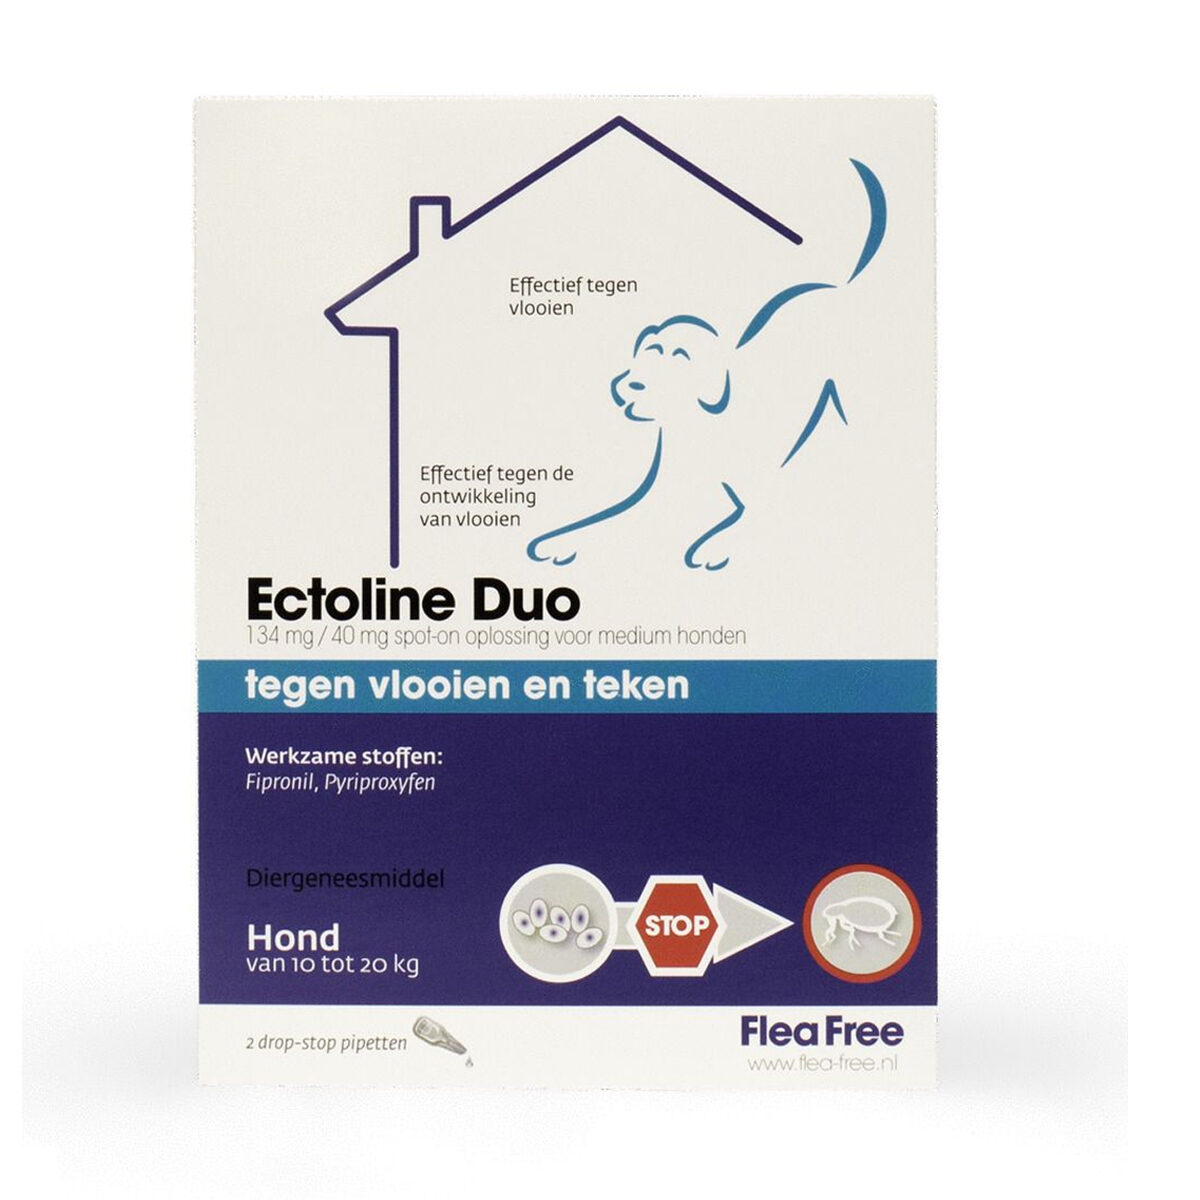 Ectoline Duo Hond 2 Pipetten 10-20 kg